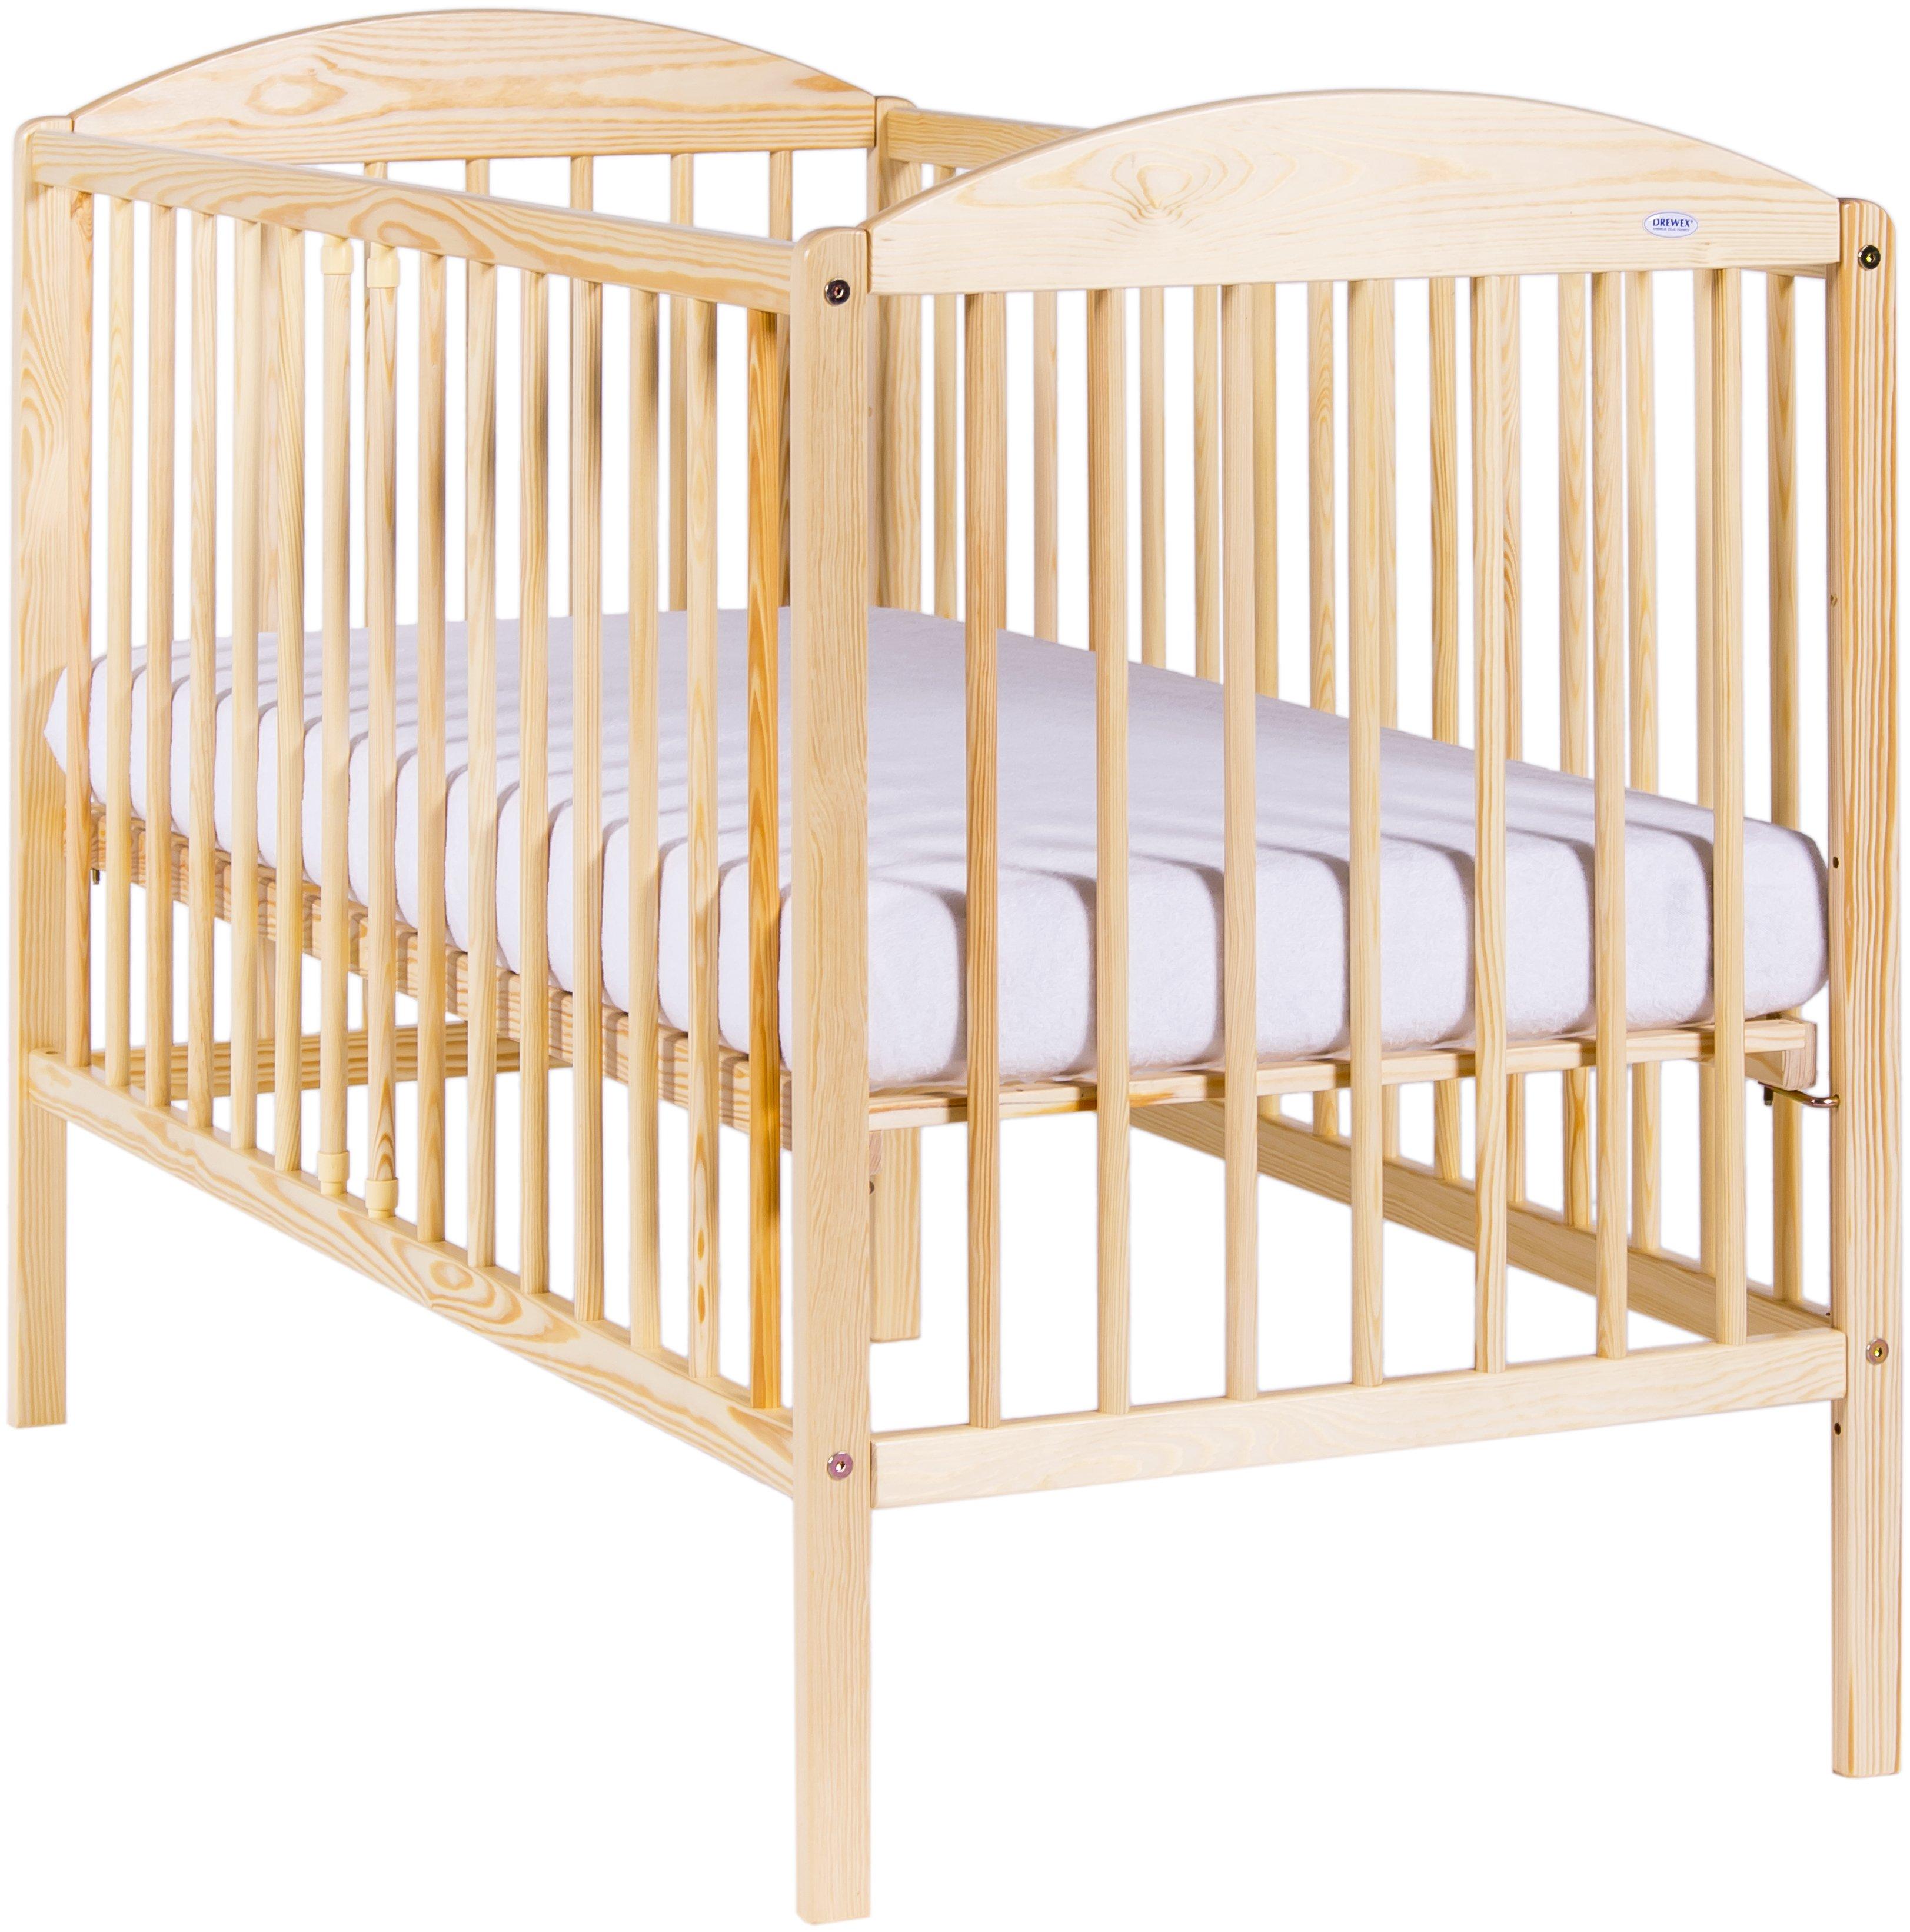 Bērnu gulta Drewex KUBA II priežu krāsas